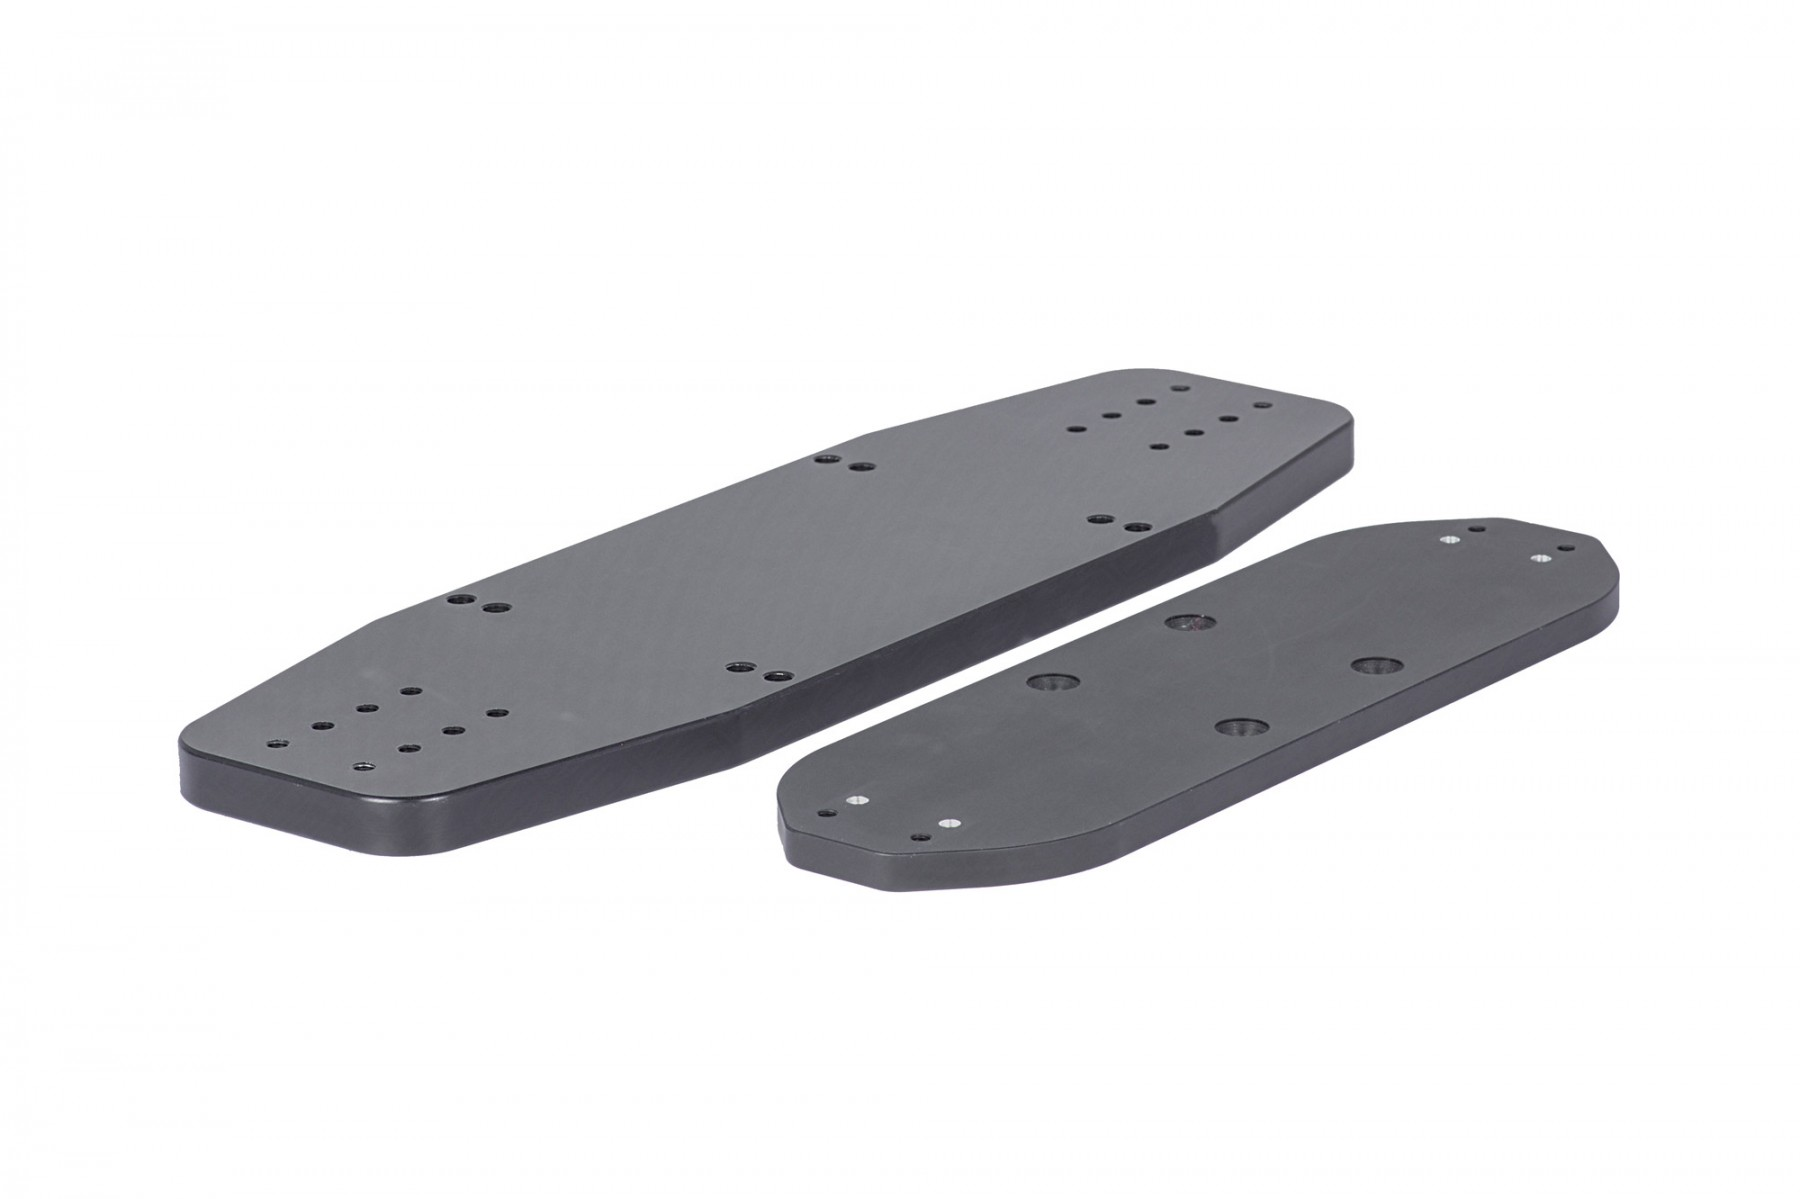 Kombination: Links #1500340 - 400 mm Halteplatte für Leitrohrschellen (Größe III), Rechts Produktabbildung